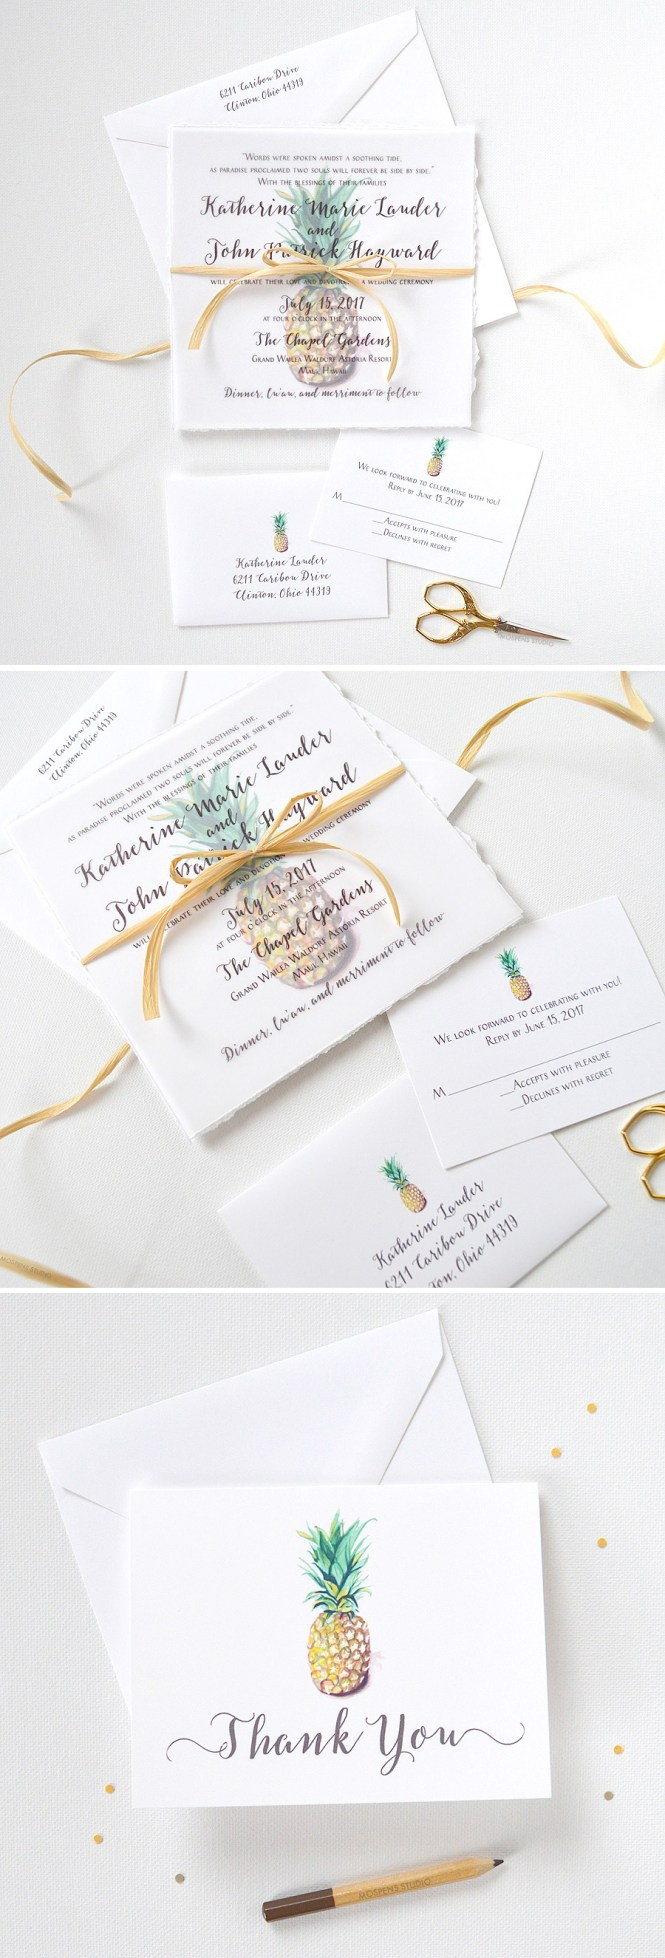 Gold Pineapple Rustic Burlap Wedding Invitations